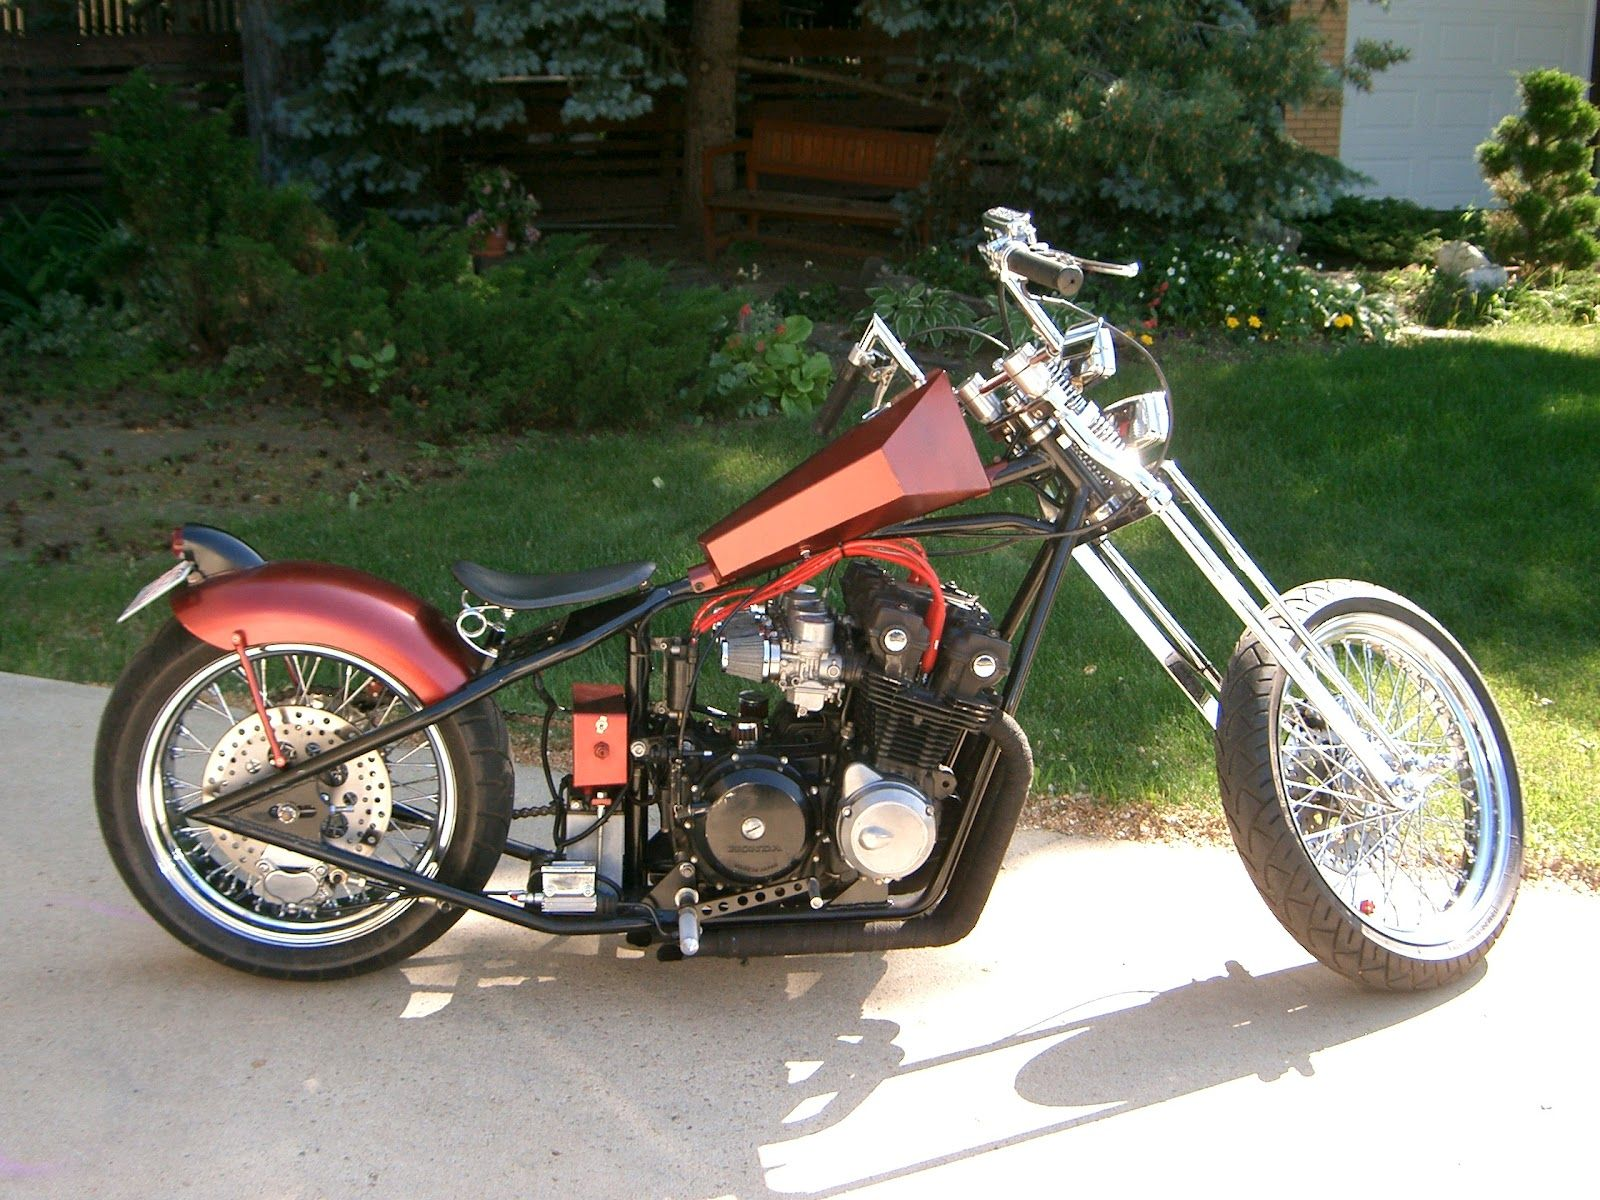 honda cb chopper cars motorcycles that i love. Black Bedroom Furniture Sets. Home Design Ideas